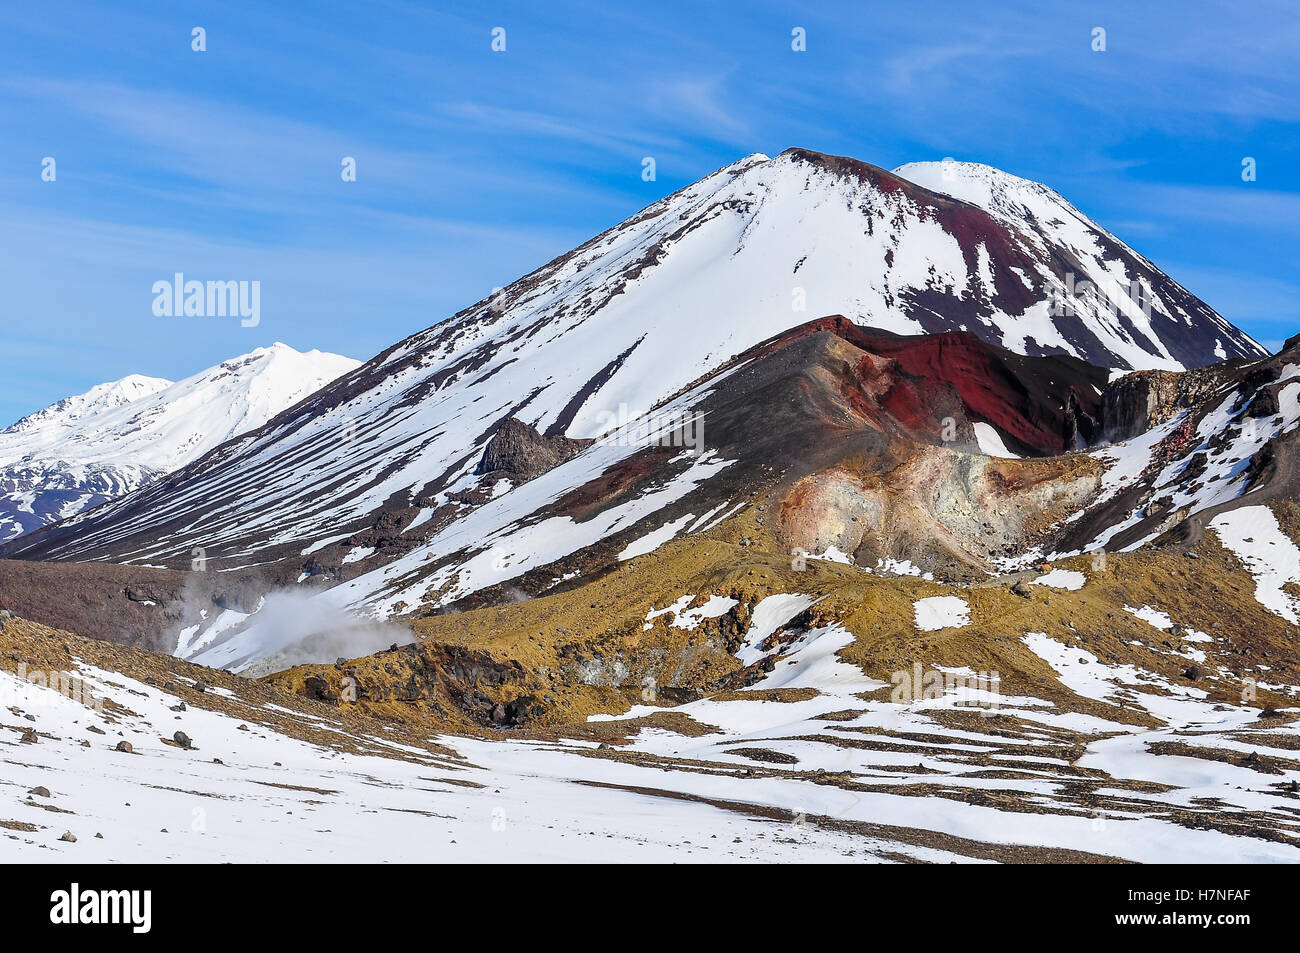 Couleurs intenses de cratère rouge à l'hiver Alpin Tongariro Crossing, New Zealand Photo Stock